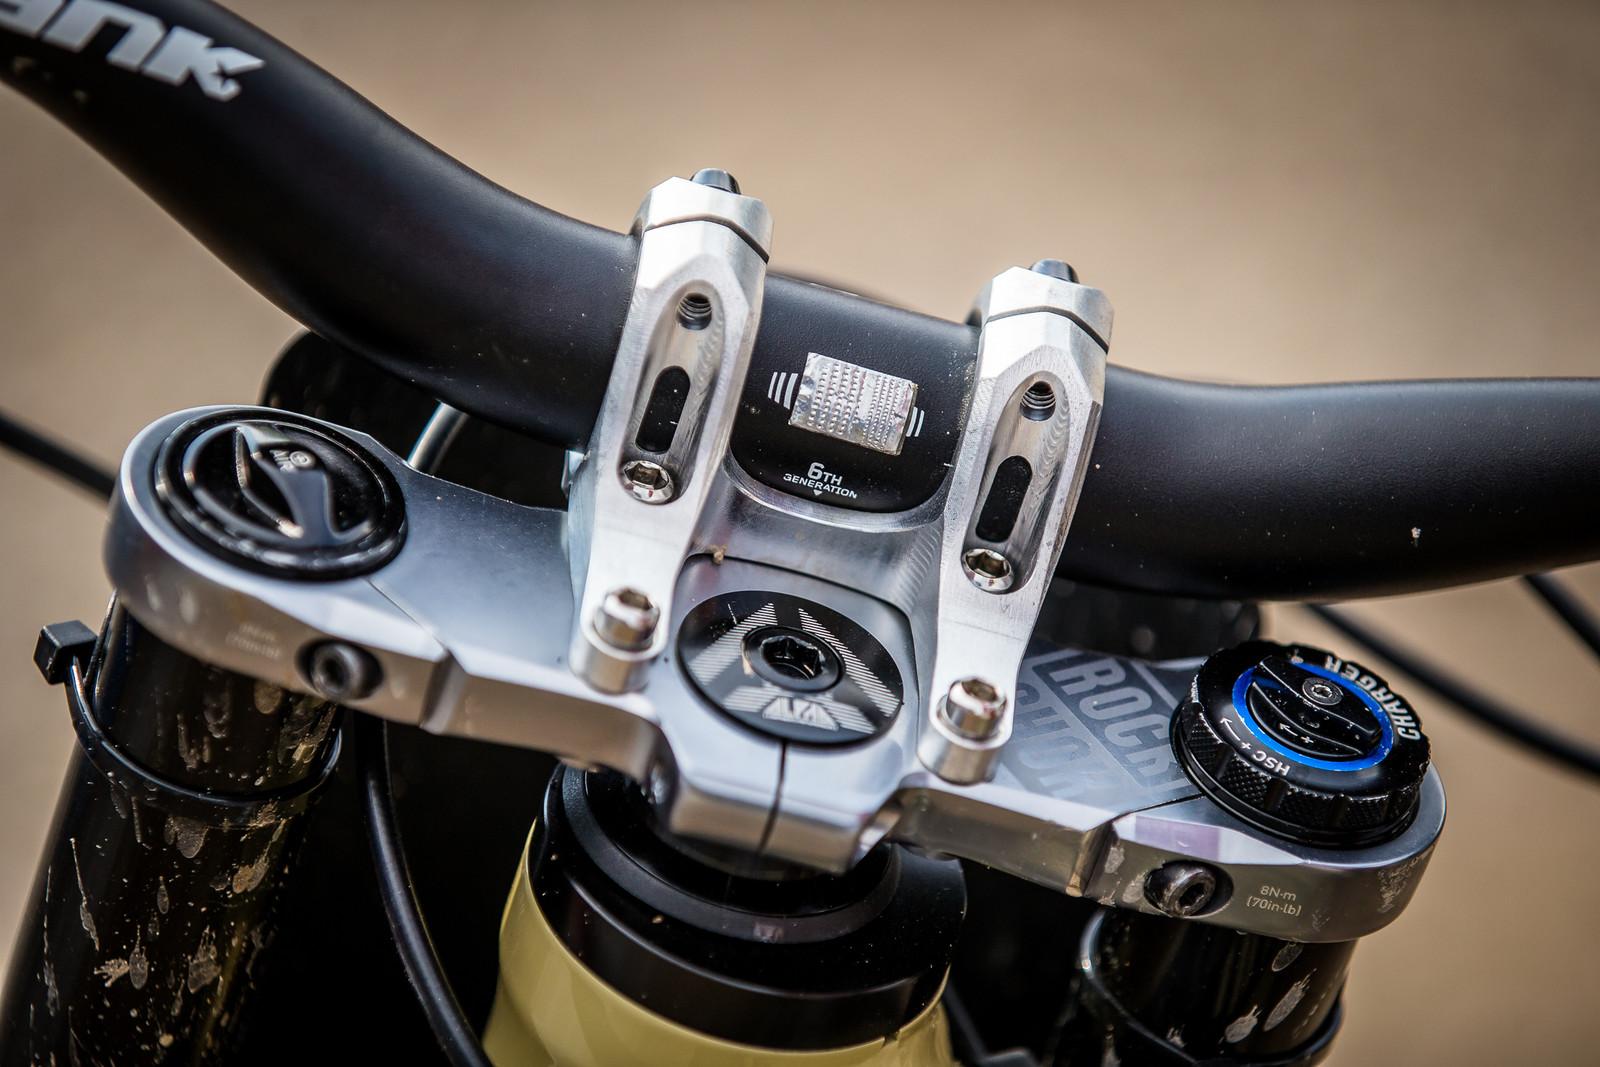 Those Anti-Vibration Thingies - WINNING BIKE - Amaury Pierron's Commencal Supreme DH 29 - Mountain Biking Pictures - Vital MTB